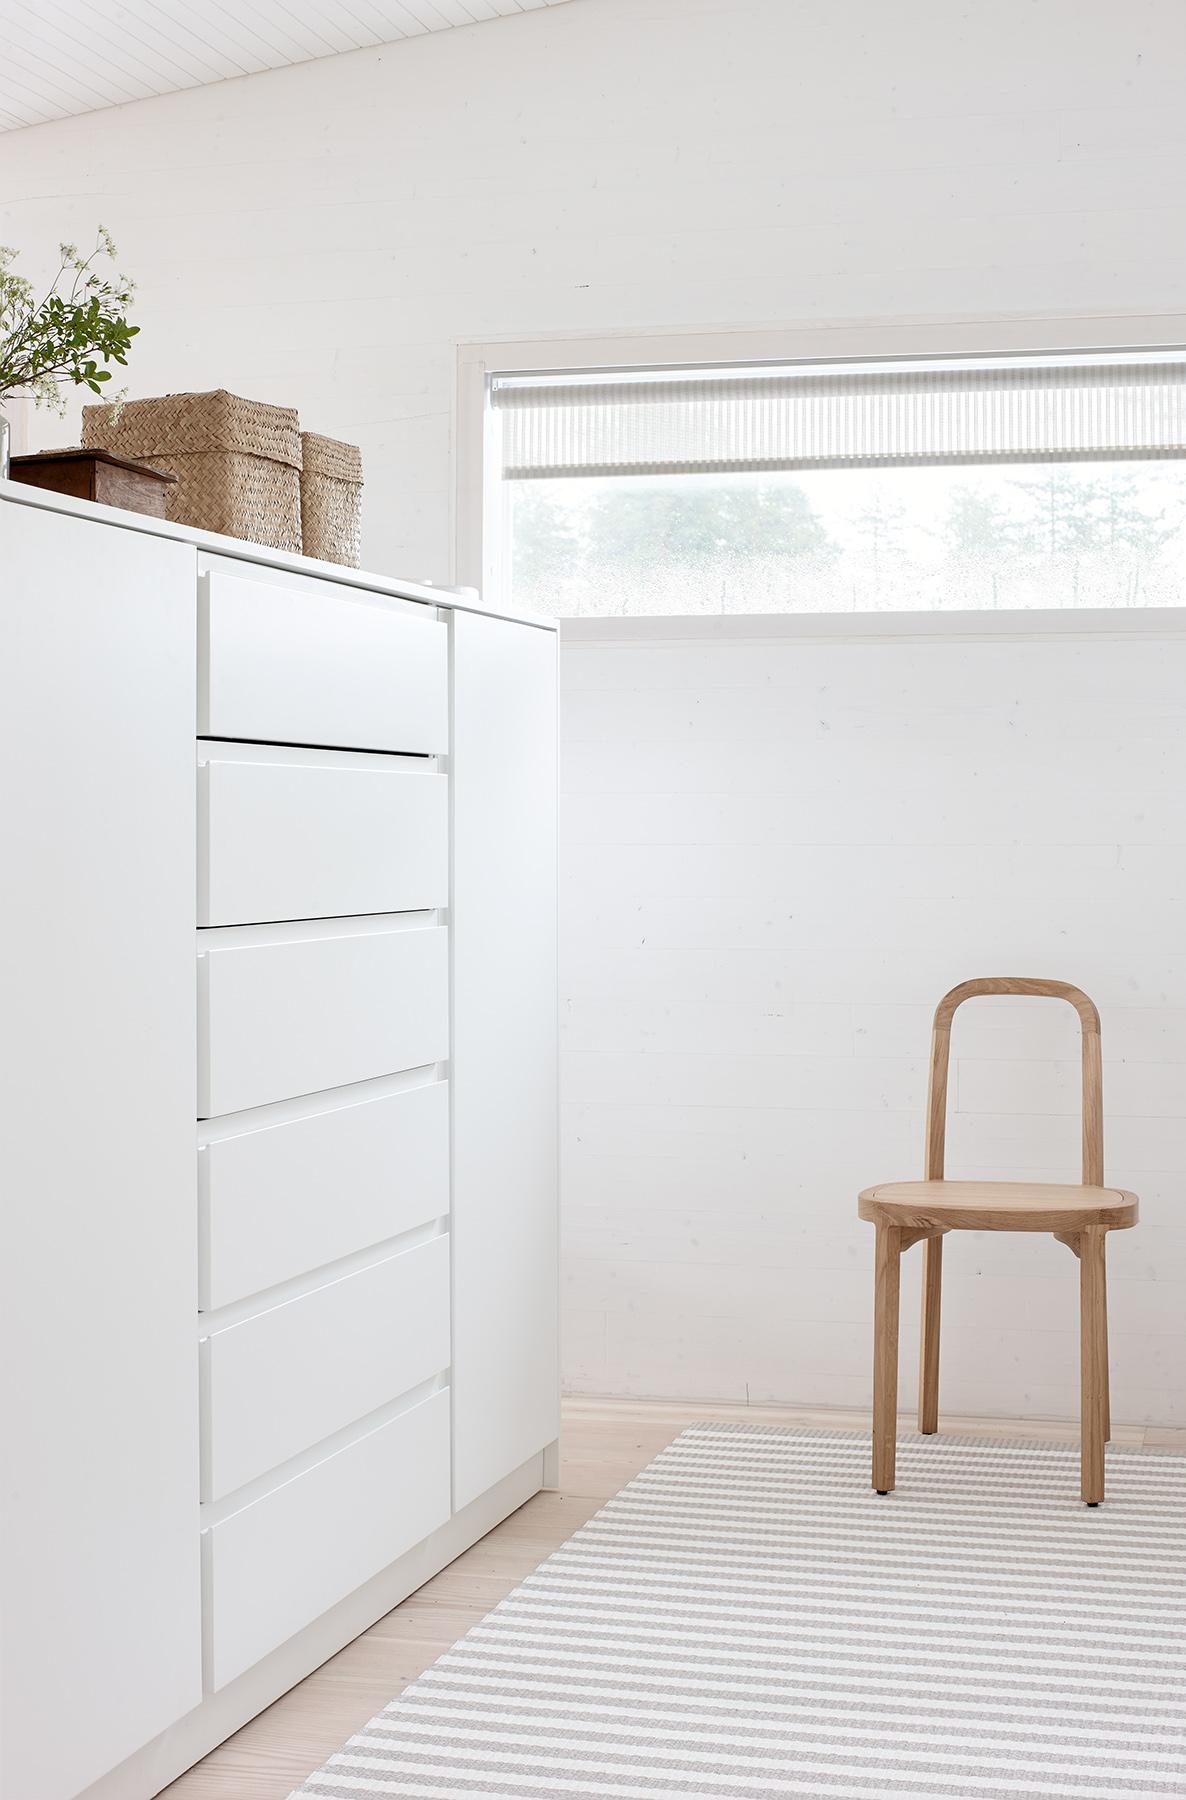 4400  Siro+  chair, 1191501 Stripe stone-white paper yarn carpet,  Vista  21311 white roller blind